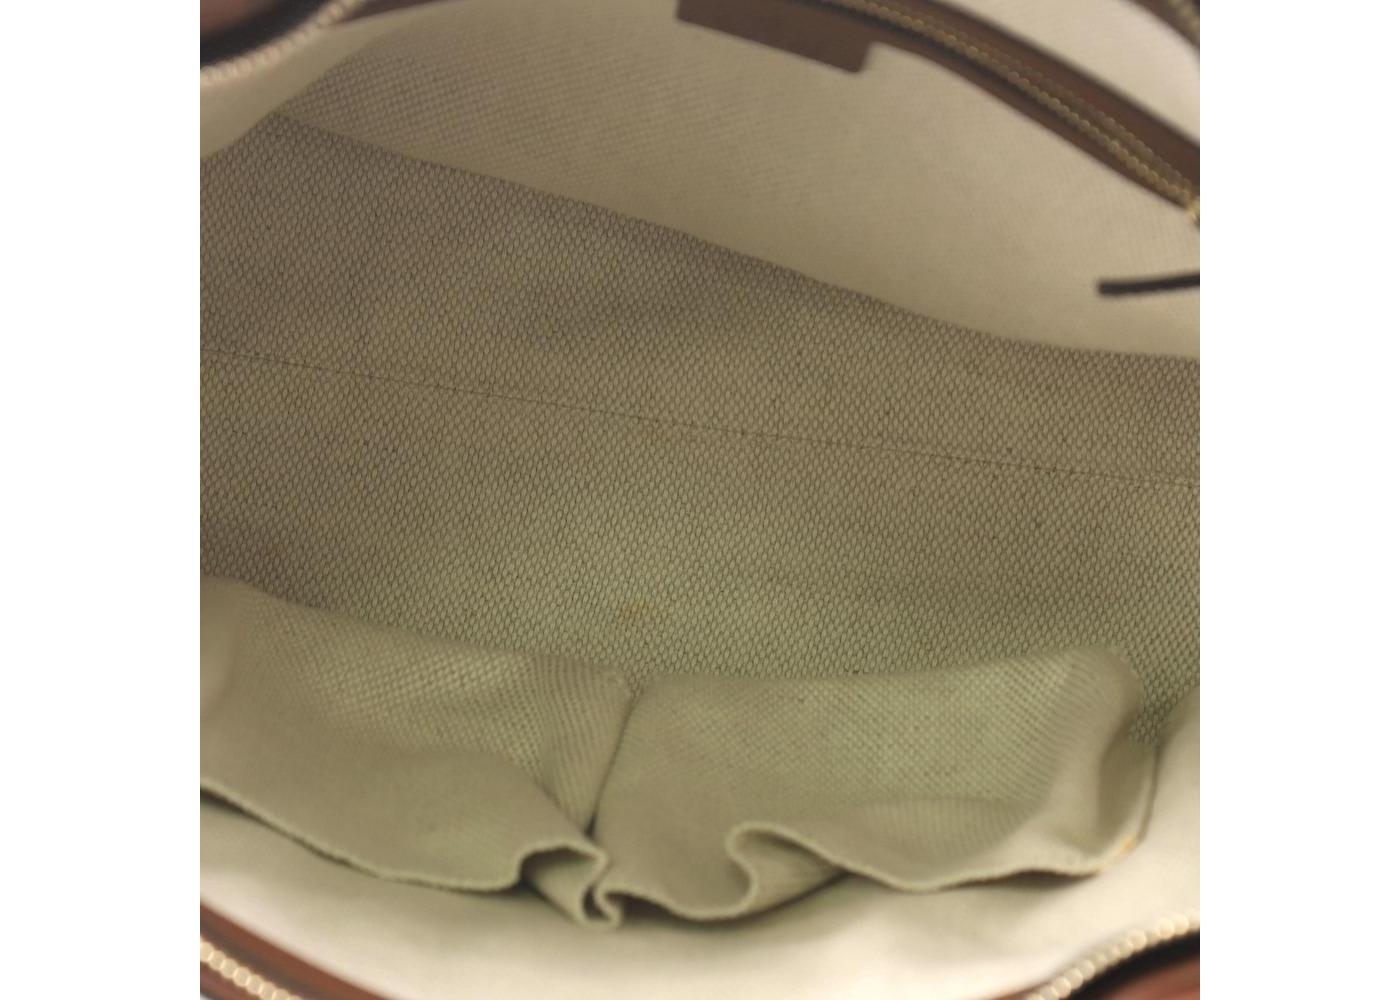 c523d5dcb26a Gucci Soho Convertible Top Handle Interlocking GG Logo Small Navy Blue/Brown